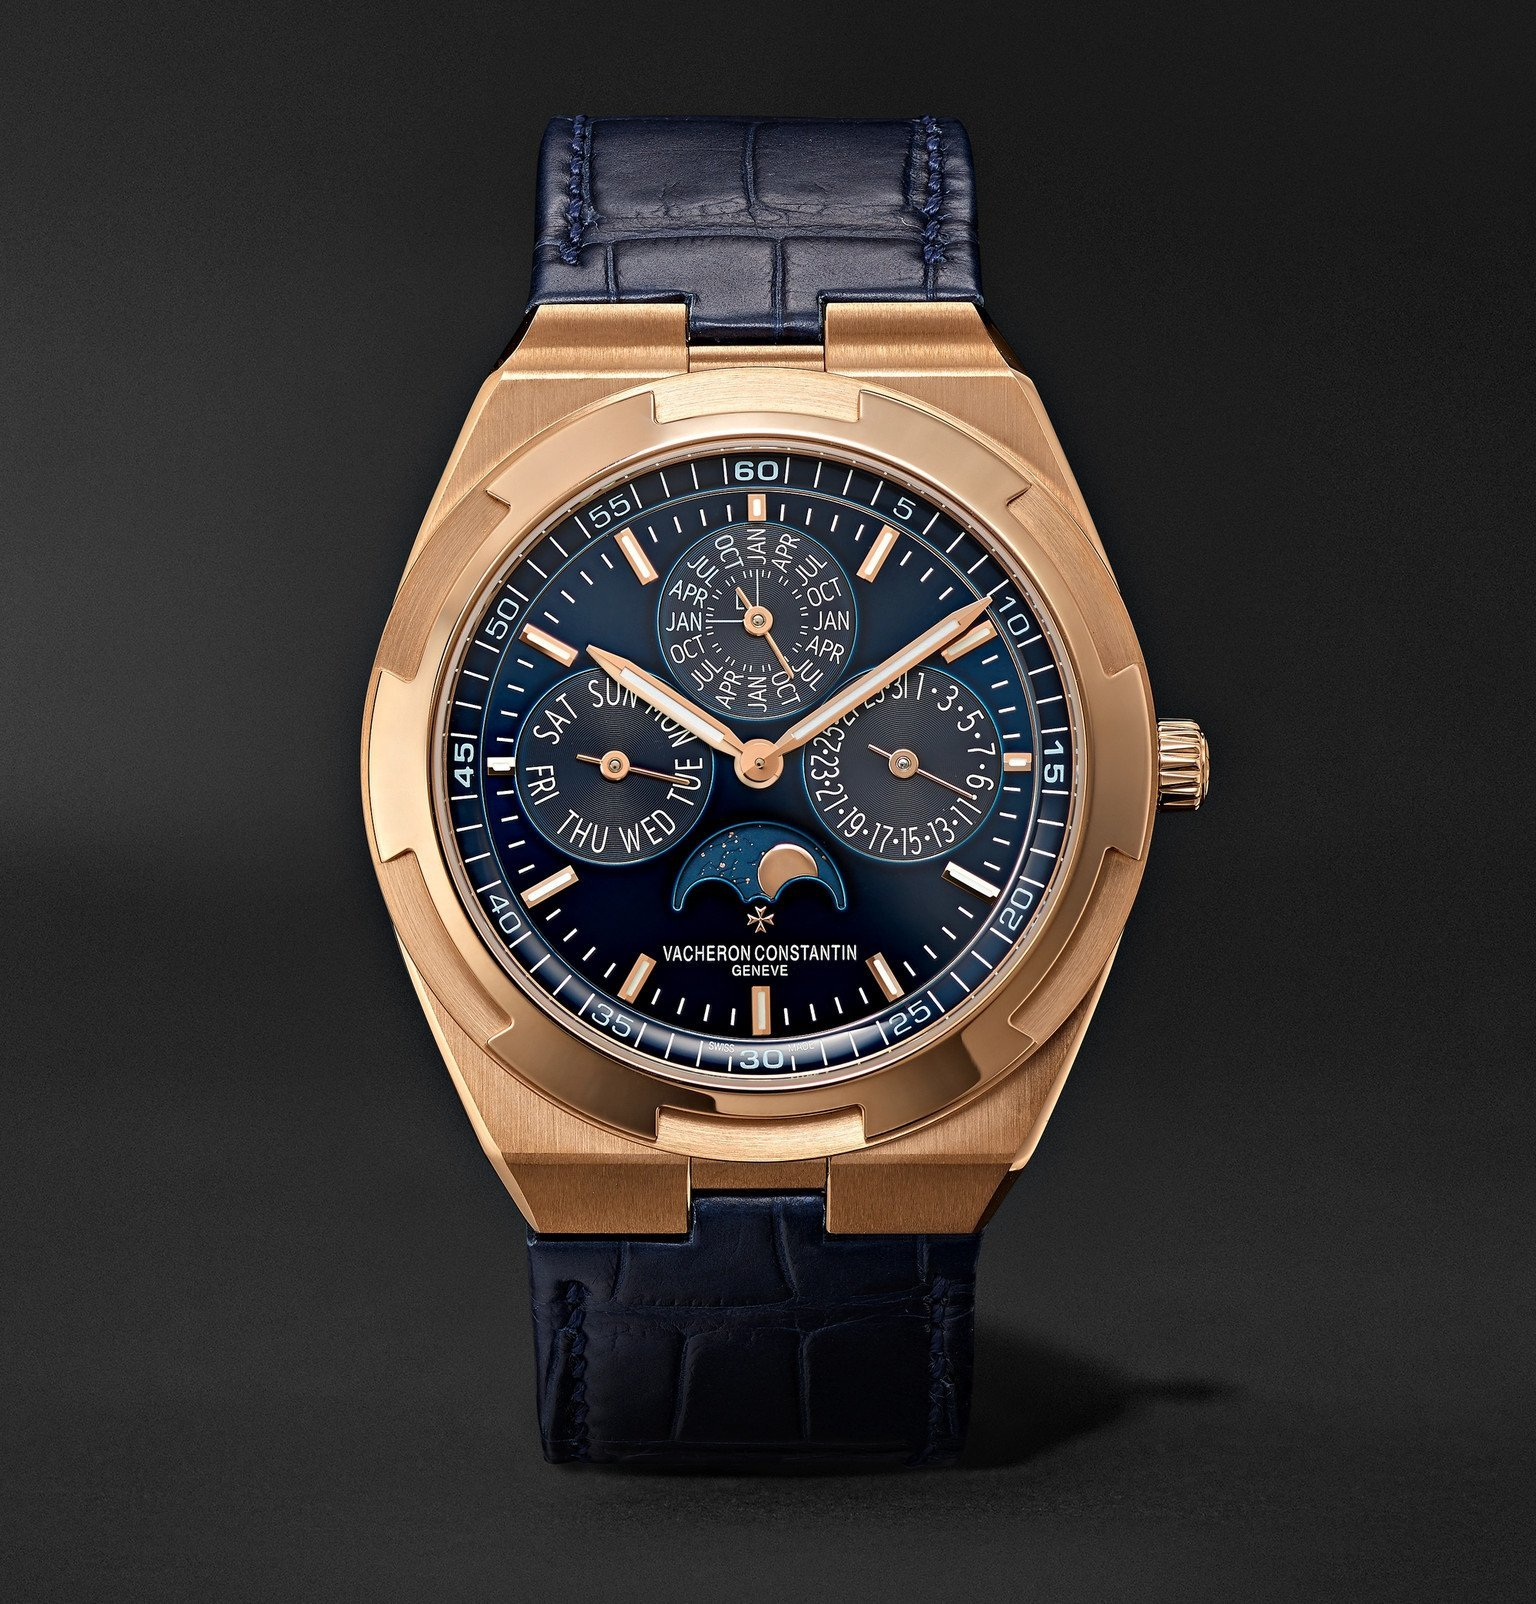 Photo: Vacheron Constantin - Overseas Perpetual Calendar Ultra-Thin Automatic 41.5mm 18-Karat Pink Gold and Alligator Watch, Ref. No. 4300V/000R-B509 - Blue